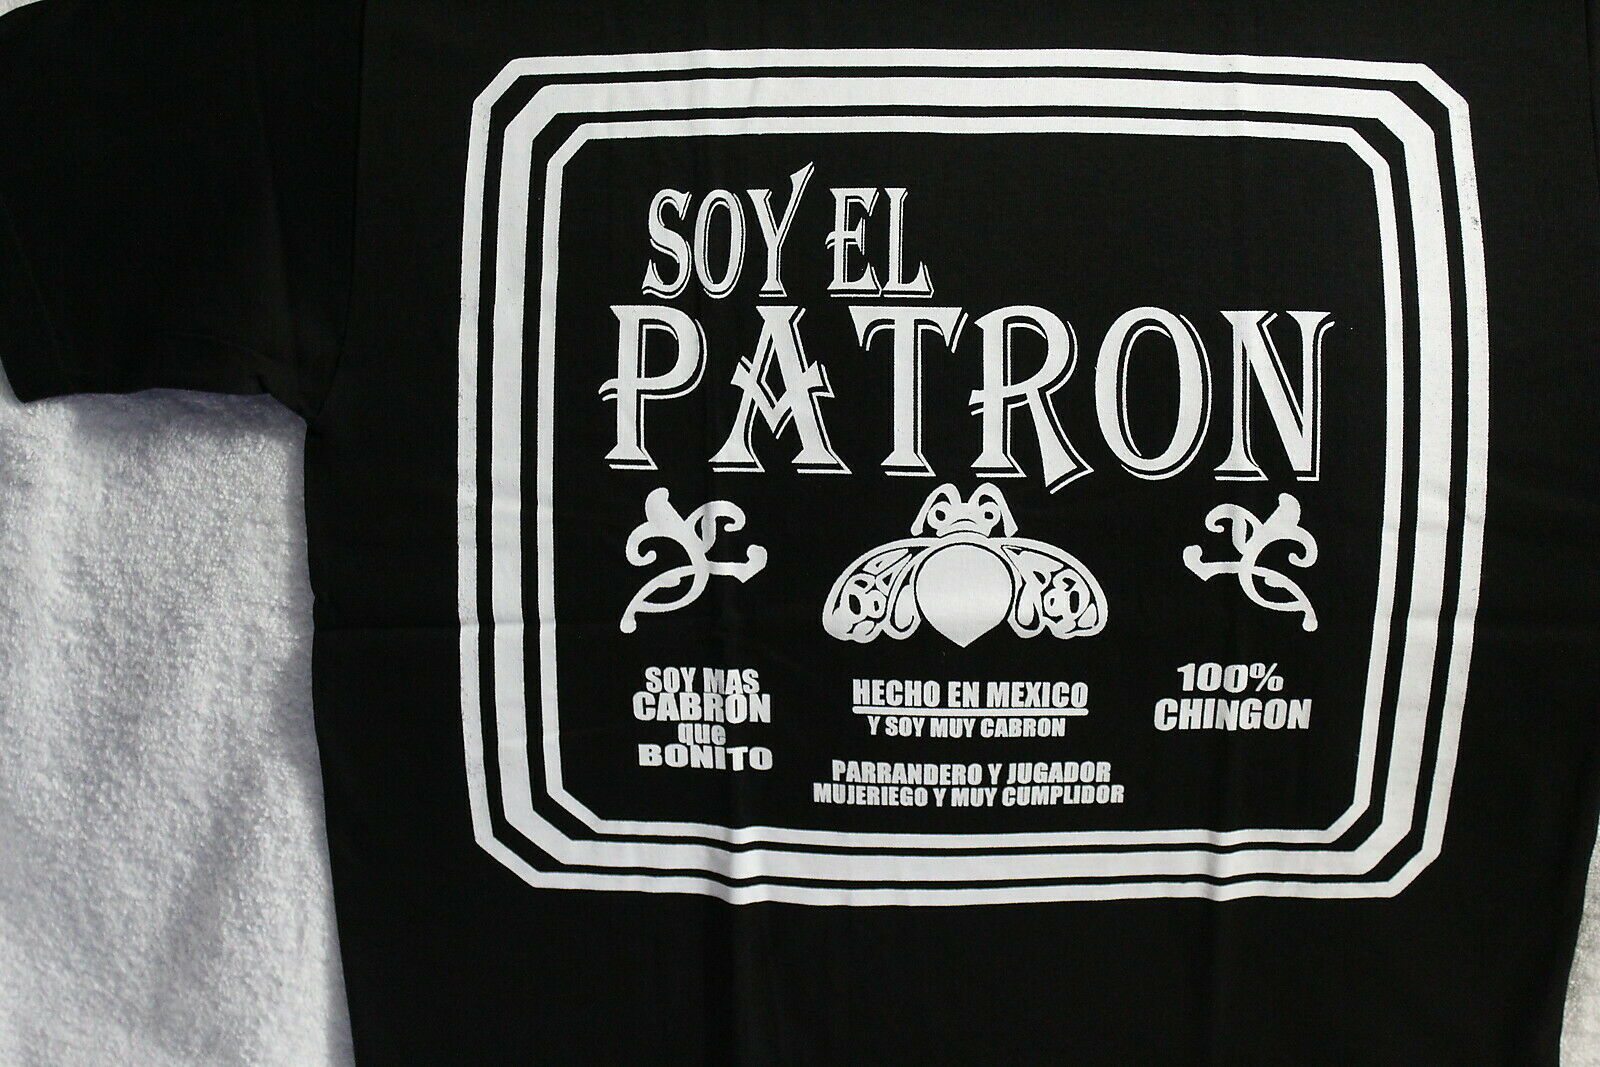 CHINGON EXTRA BONITO MEXICO MEXICAN ROOTS FUNNY LATINO CORONA T-SHIRT SHIRT